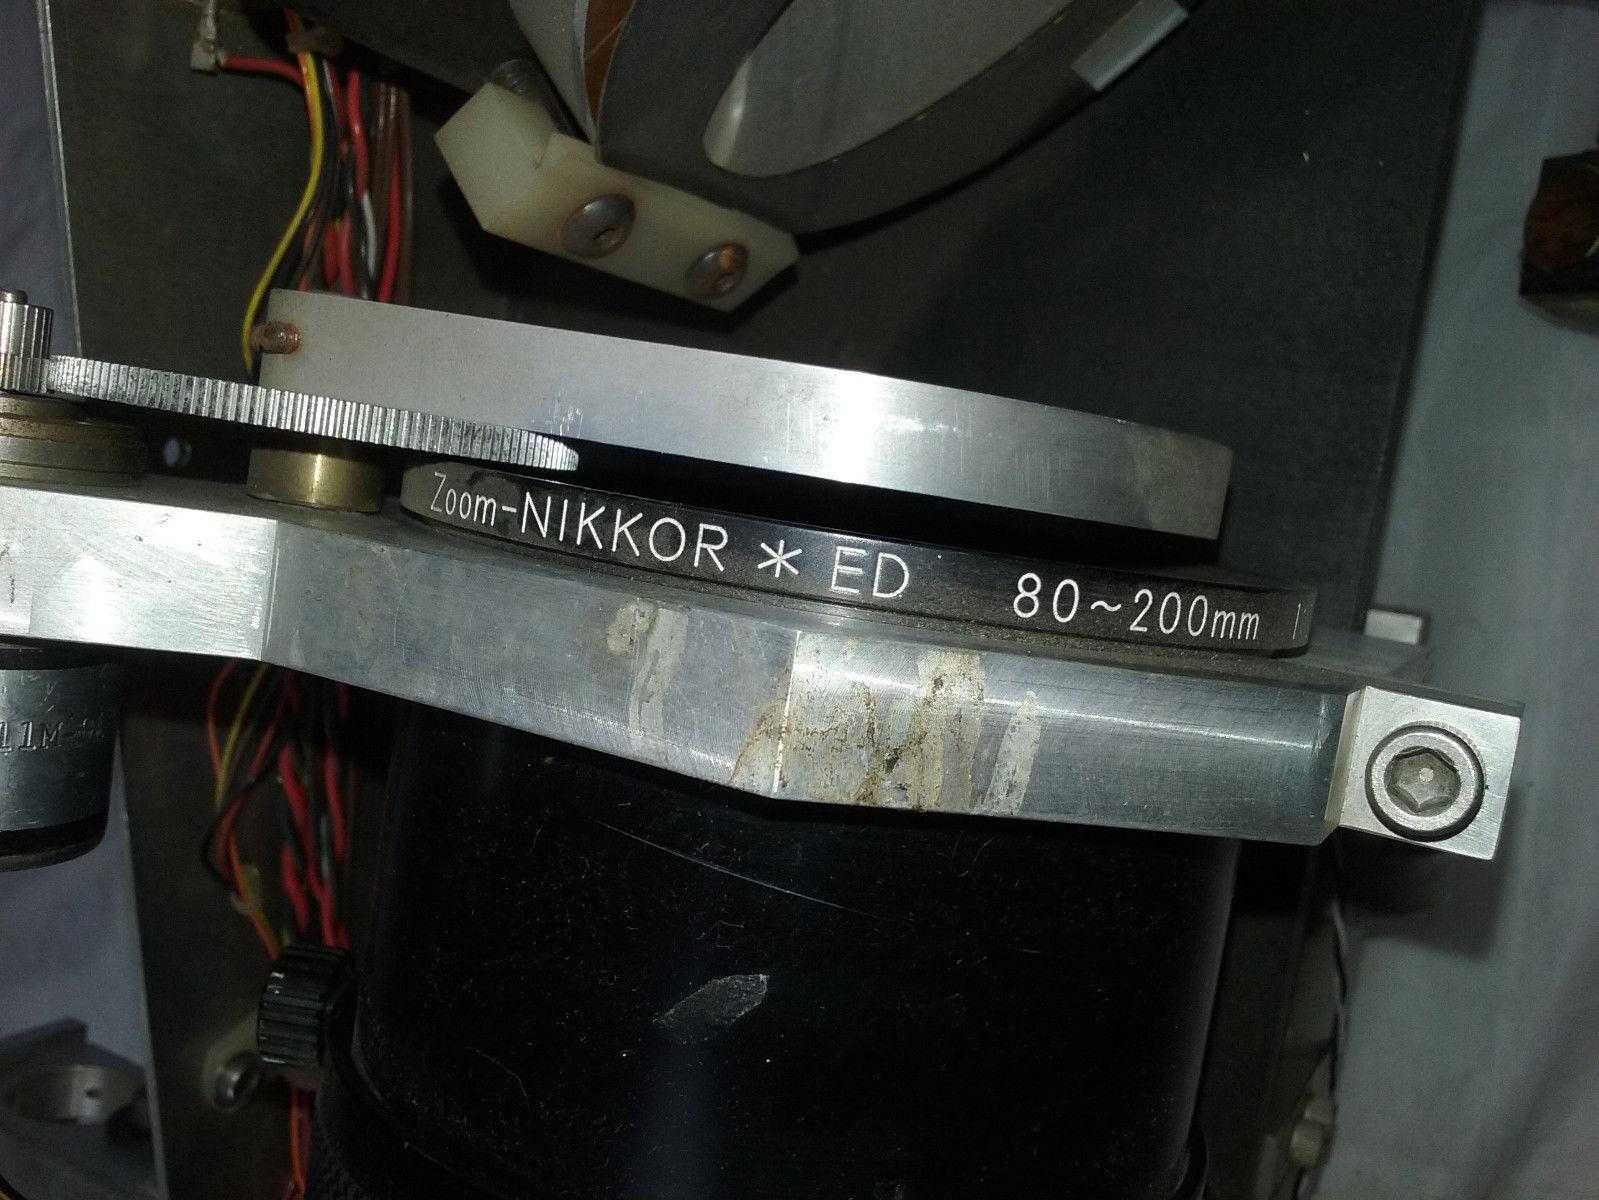 Newport Optical Mount 600A-4 Nikkor 80-200mm Lab Equipment Laser Photonics Lens image 3